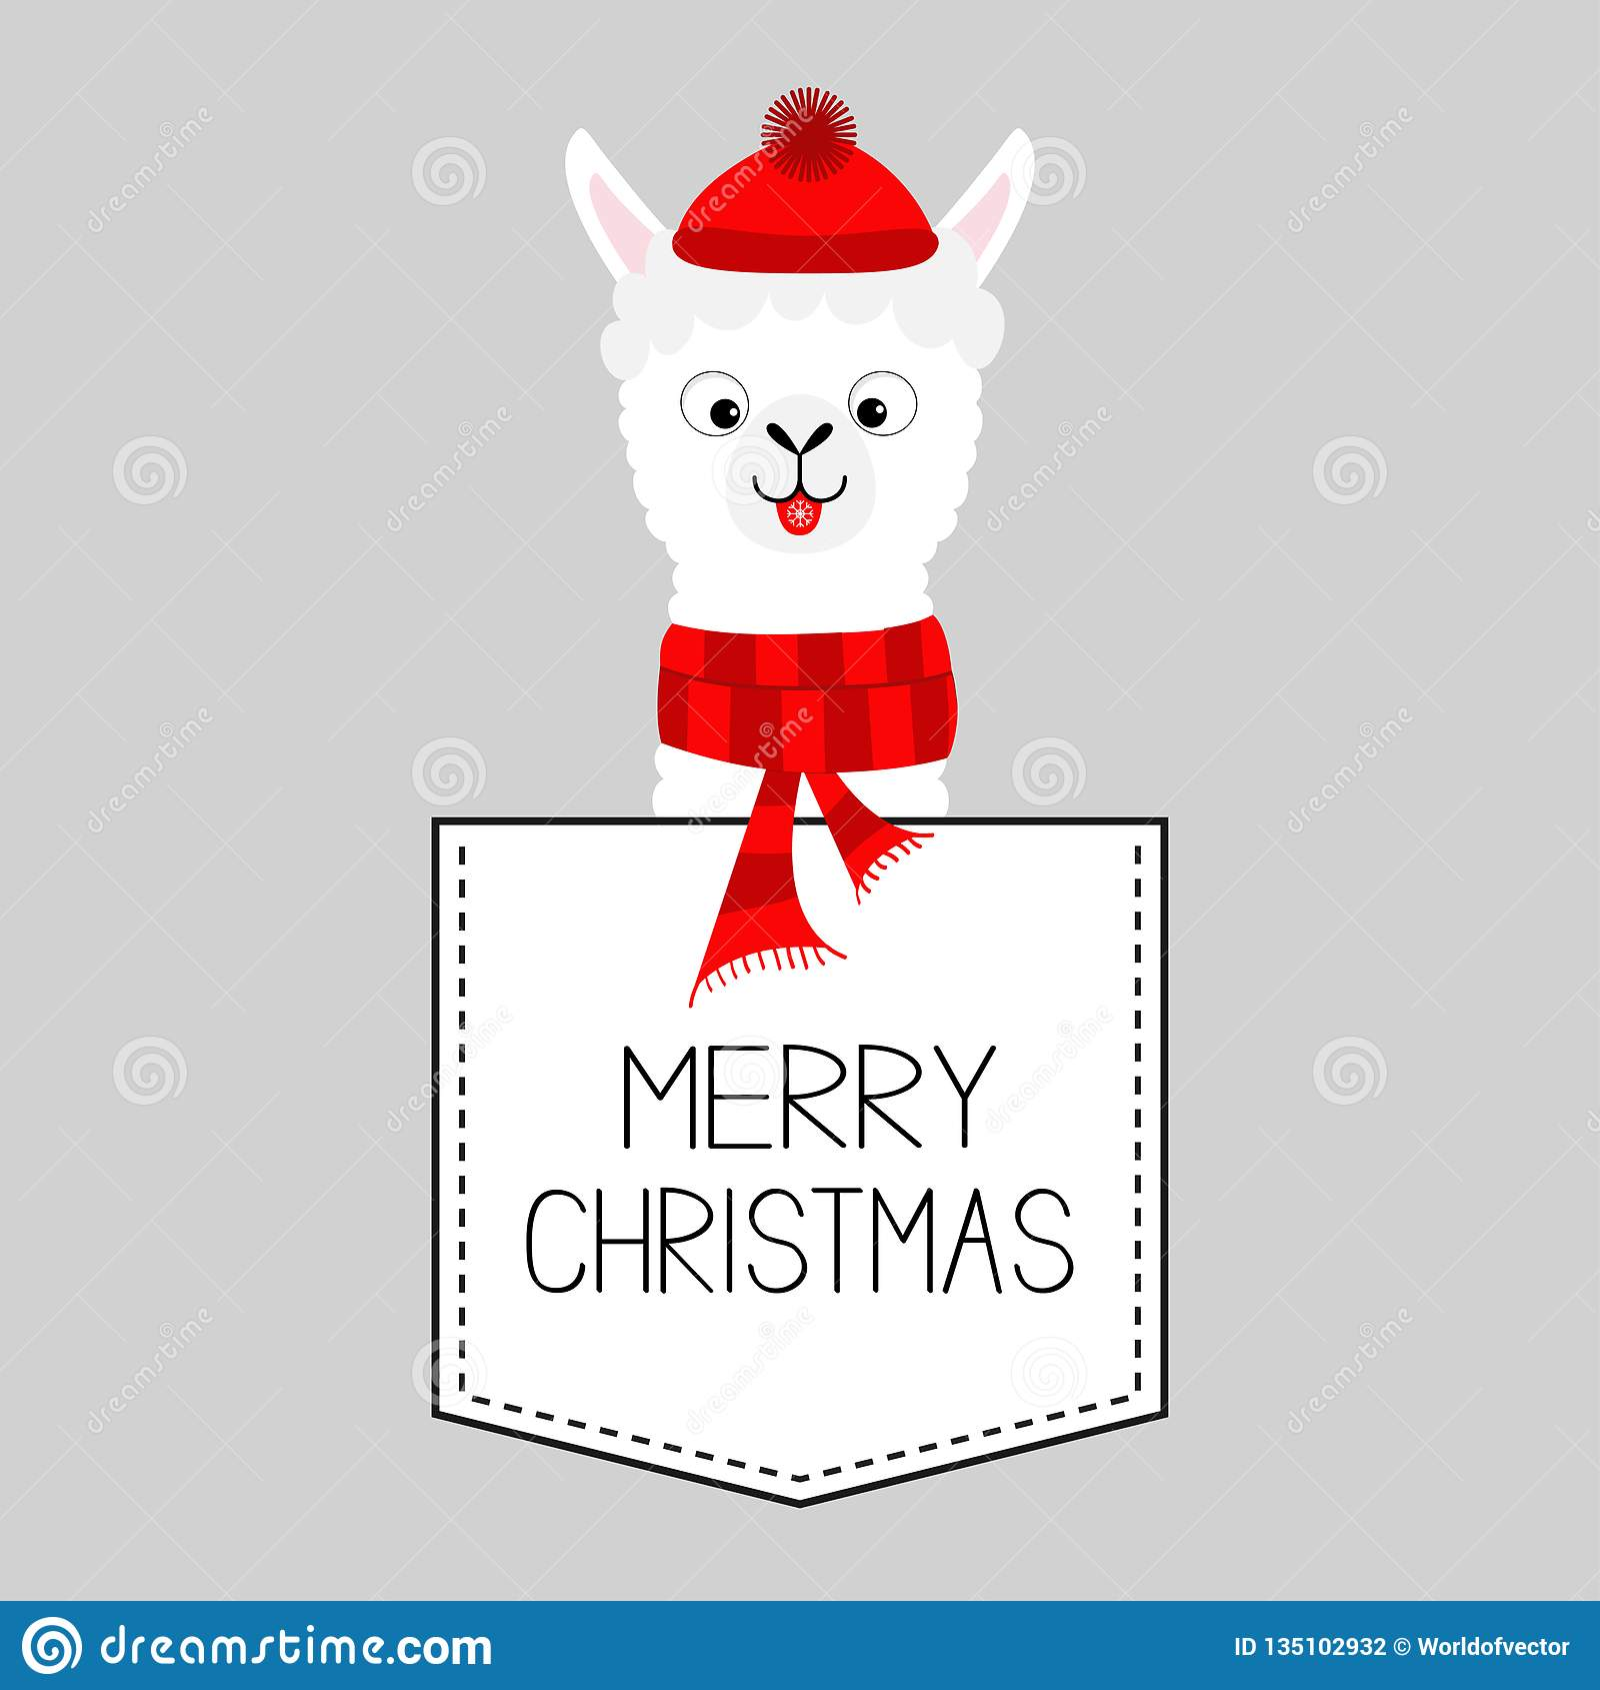 9f79e966a02023 Merry Christmas. LLama alpaca animal. Dash line. Kawaii character. White  and black color. T-shirt design. Baby gray background.